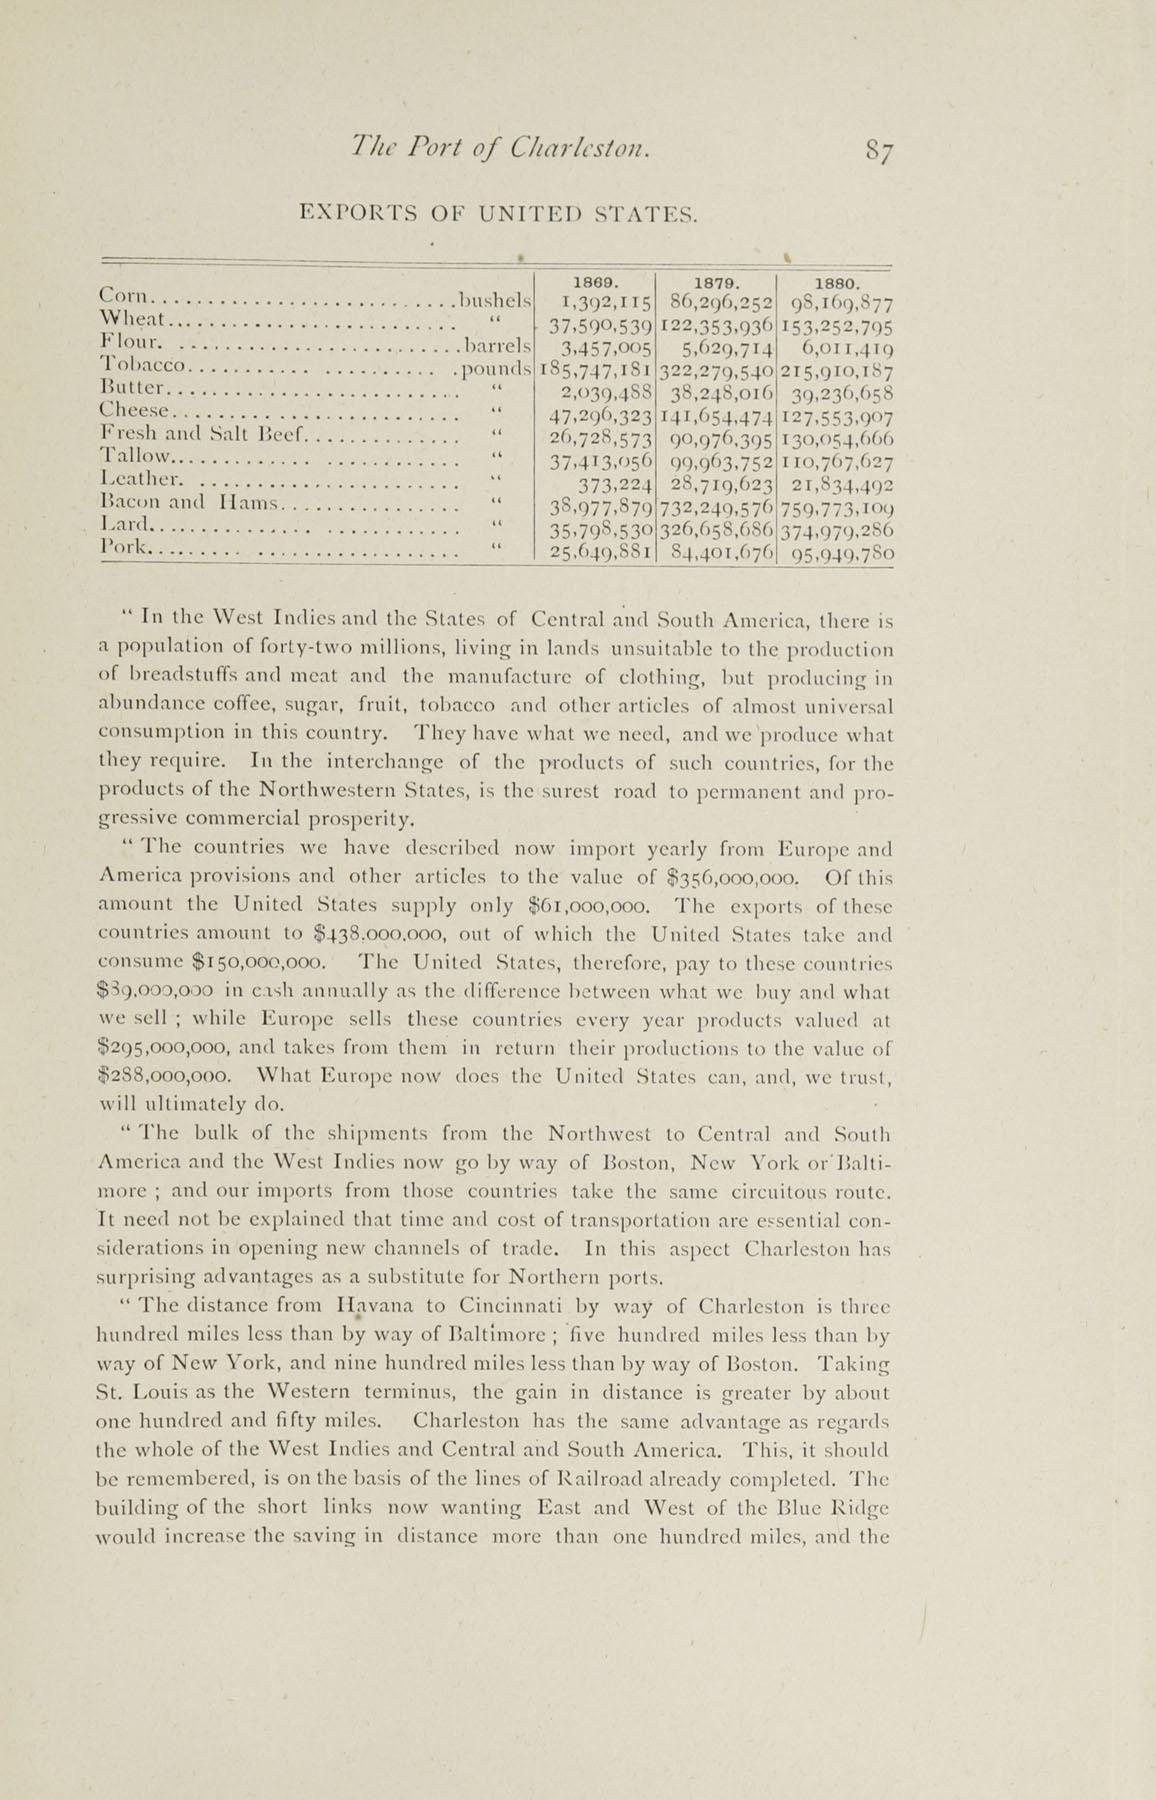 Charleston Year book, 1880, page 87